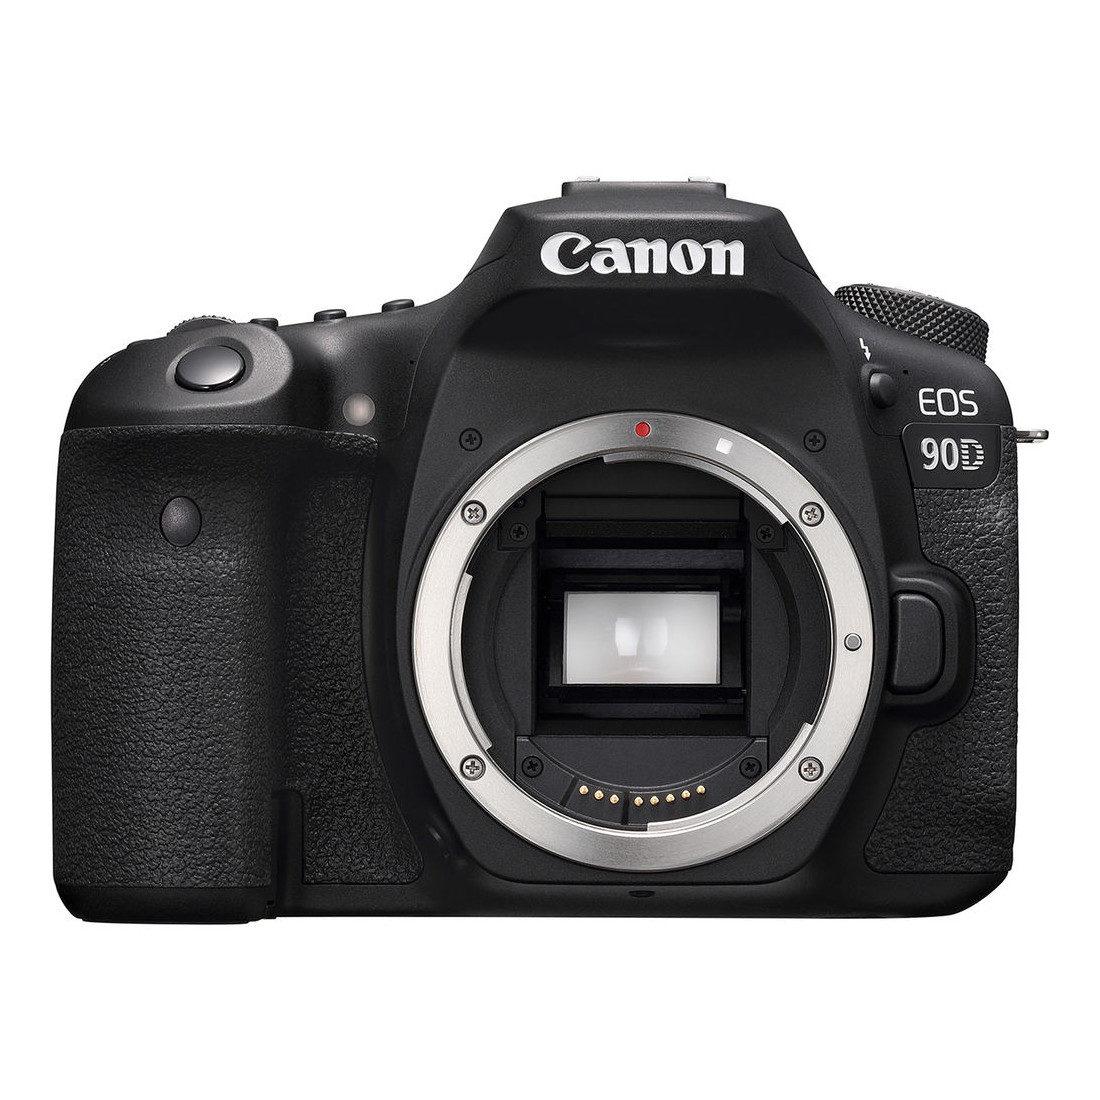 Canon EOS 90D DSLR Body <br/>€ 1299.00 <br/> <a href='https://www.cameranu.nl/fotografie/?tt=12190_474631_241358_&r=https%3A%2F%2Fwww.cameranu.nl%2Fnl%2Fp3071622%2Fcanon-eos-90d-dslr-body%3Fchannable%3De10841.MzA3MTYyMg%26utm_campaign%3D%26utm_content%3DEOS%2Bspiegelreflex%26utm_source%3DTradetracker%26utm_medium%3Dcpc%26utm_term%3DDigitale%2Bcamera%26apos%3Bs' target='_blank'>naar de winkel</a>